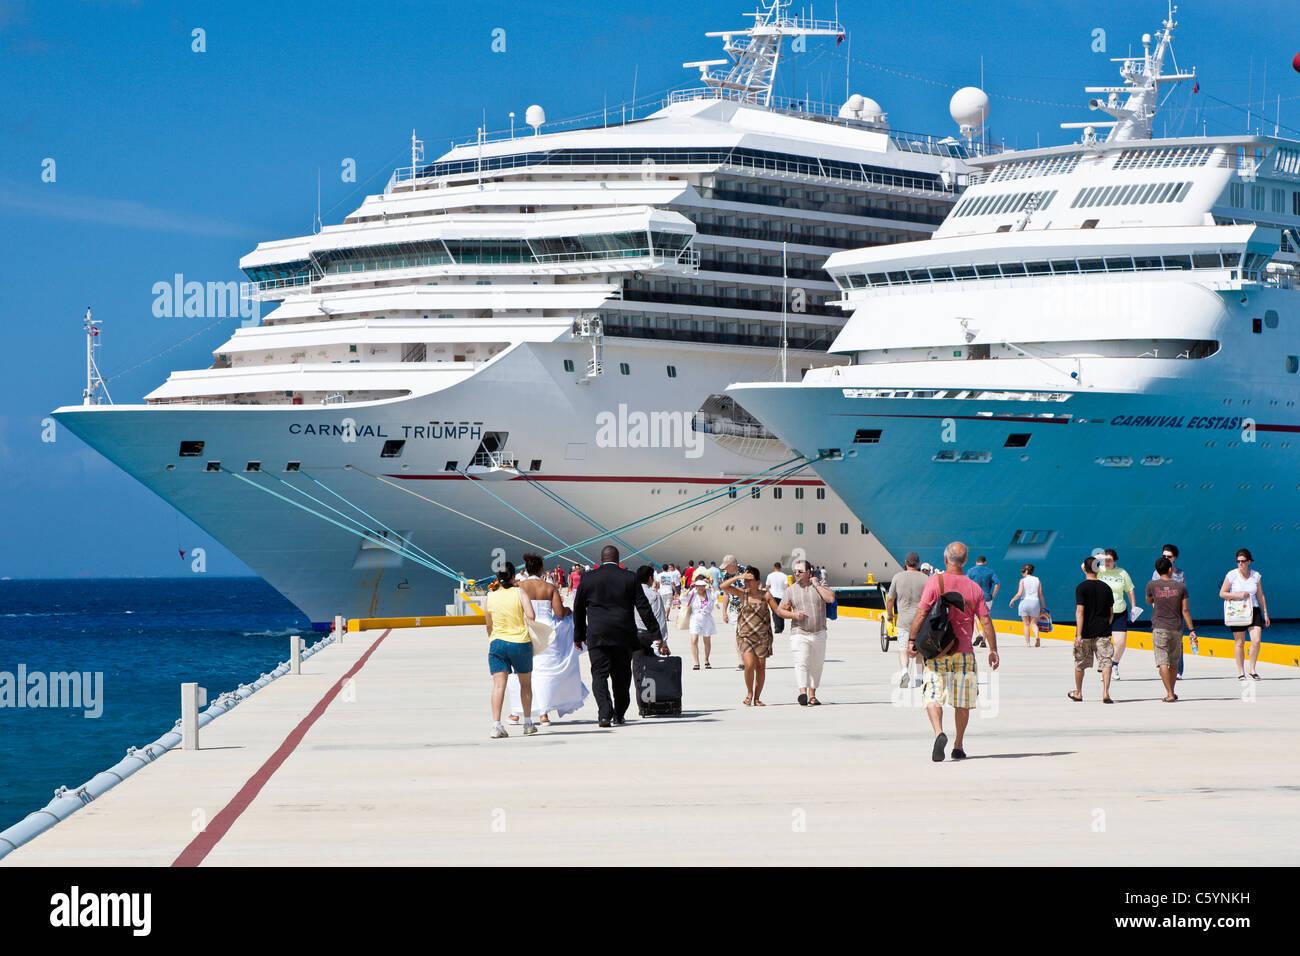 Wedding Cruise Stockfotos & Wedding Cruise Bilder - Alamy